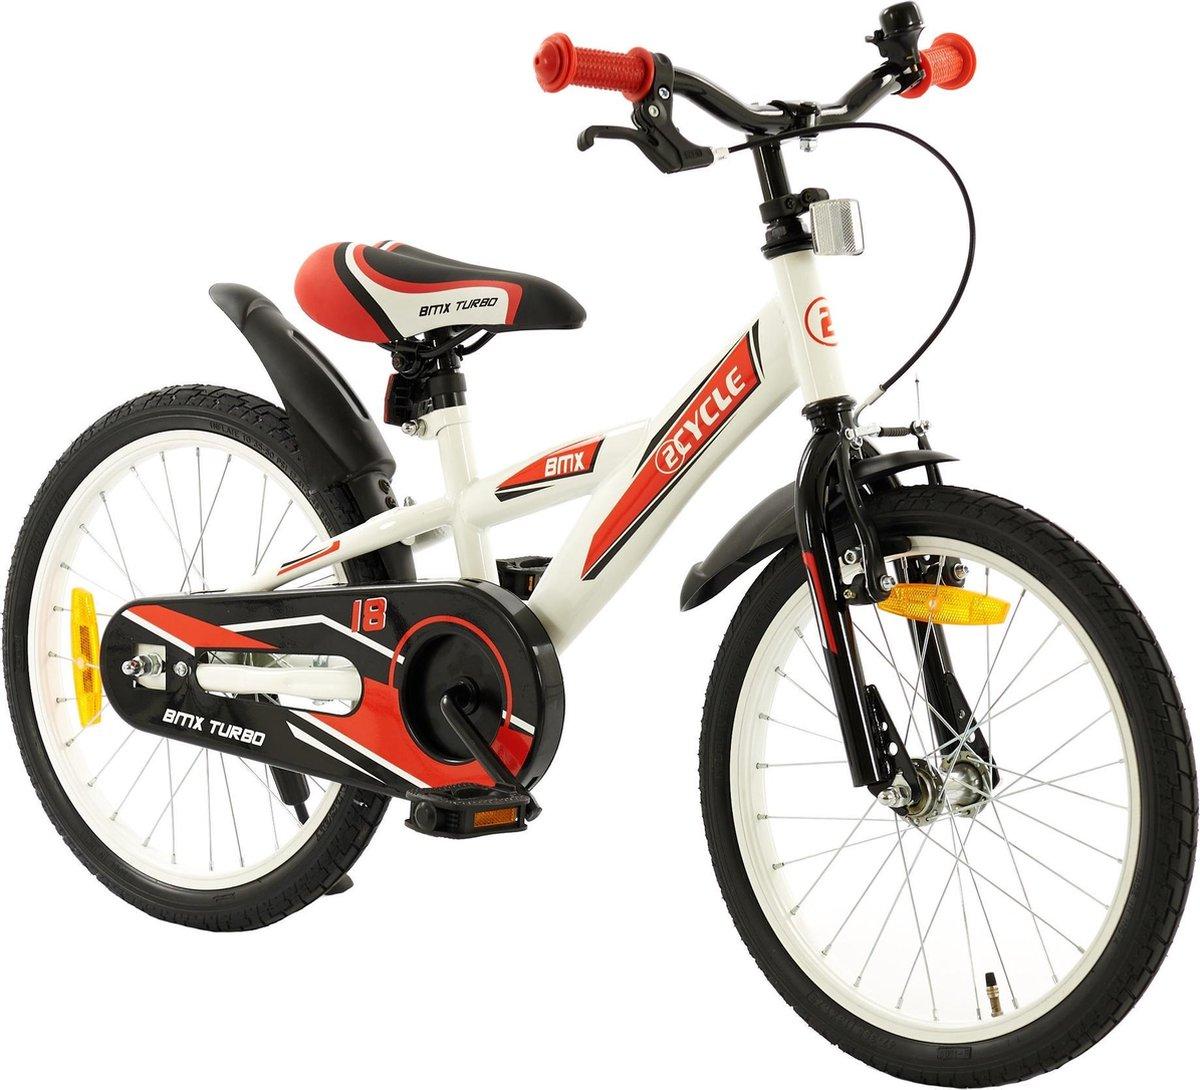 2Cycle BMX Kinderfiets - 18 inch - Wit-Rood - Jongensfiets